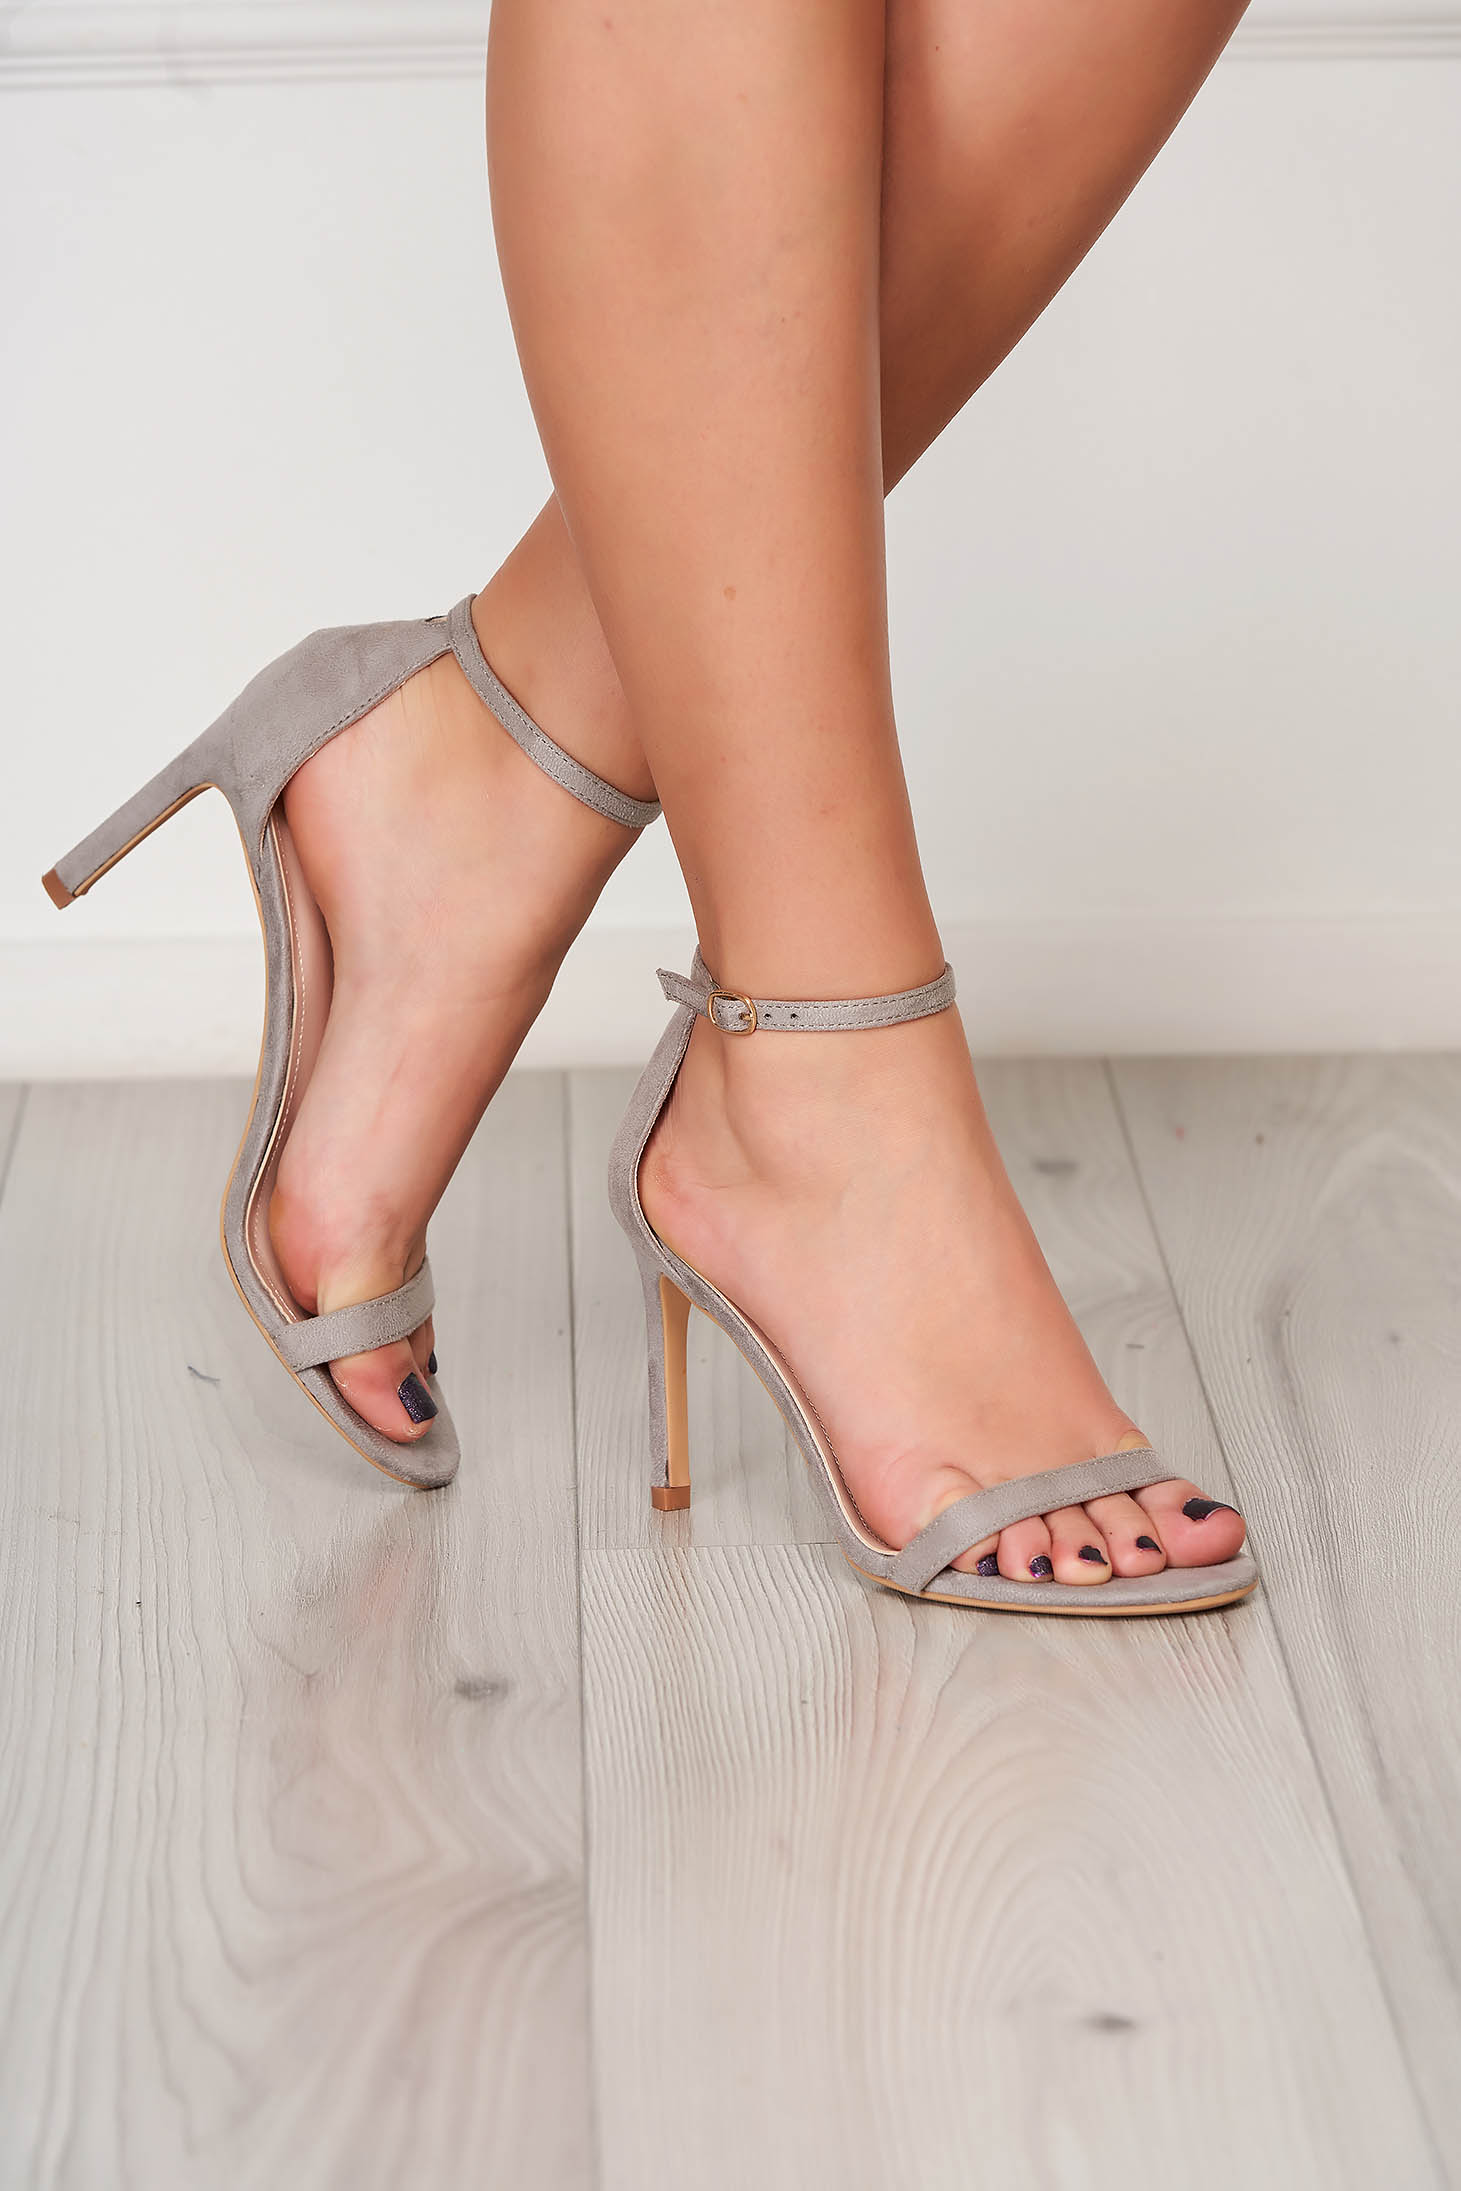 Sandale gri elegante cu barete subtiri din material catifelat